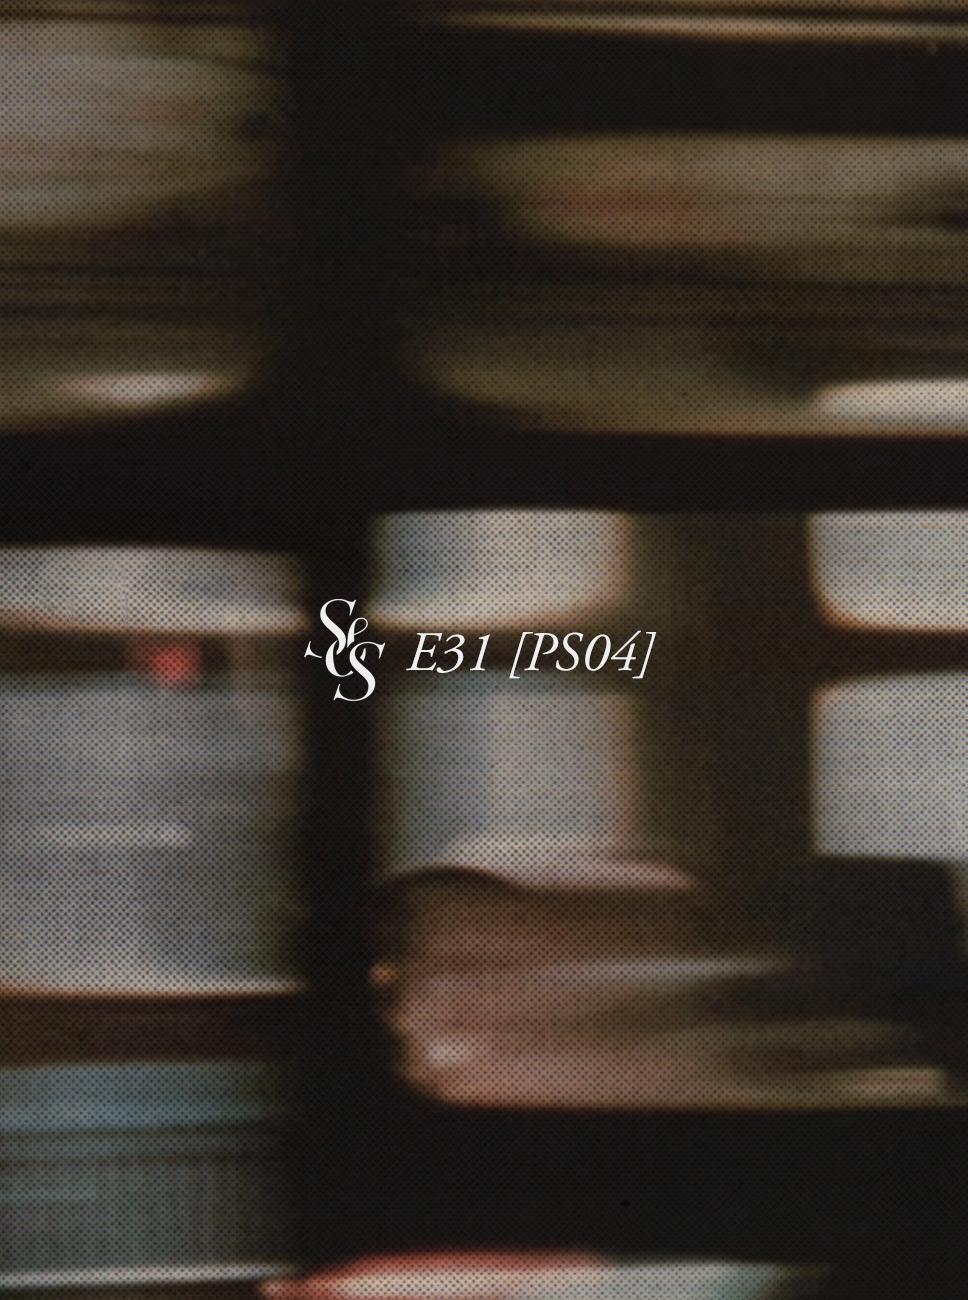 S&S-NewtownRadio-E31